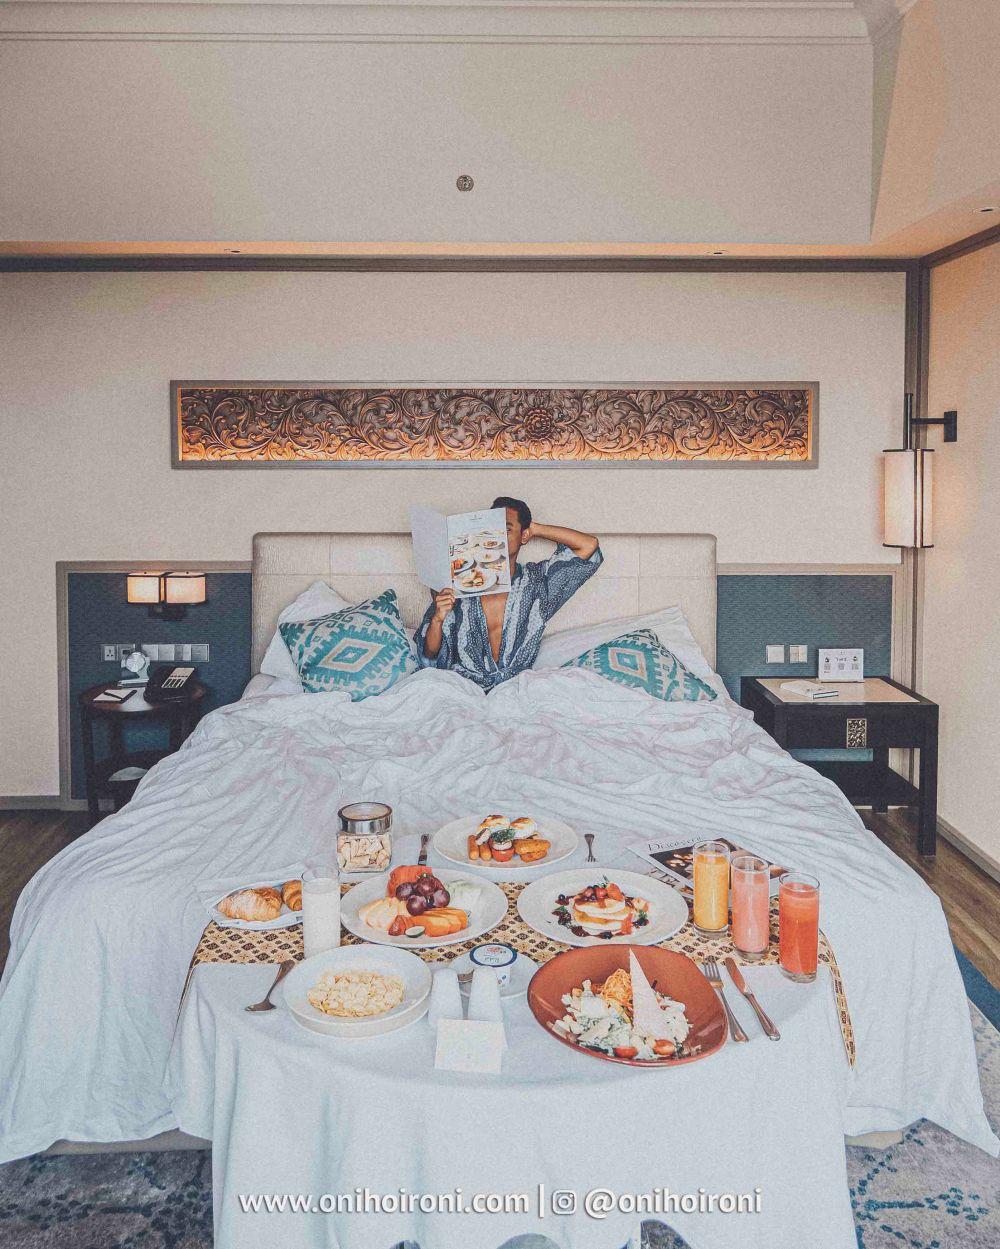 7 Review explore ROOM KAMAR Shangrila Surabaya Hotel Oni hoironi